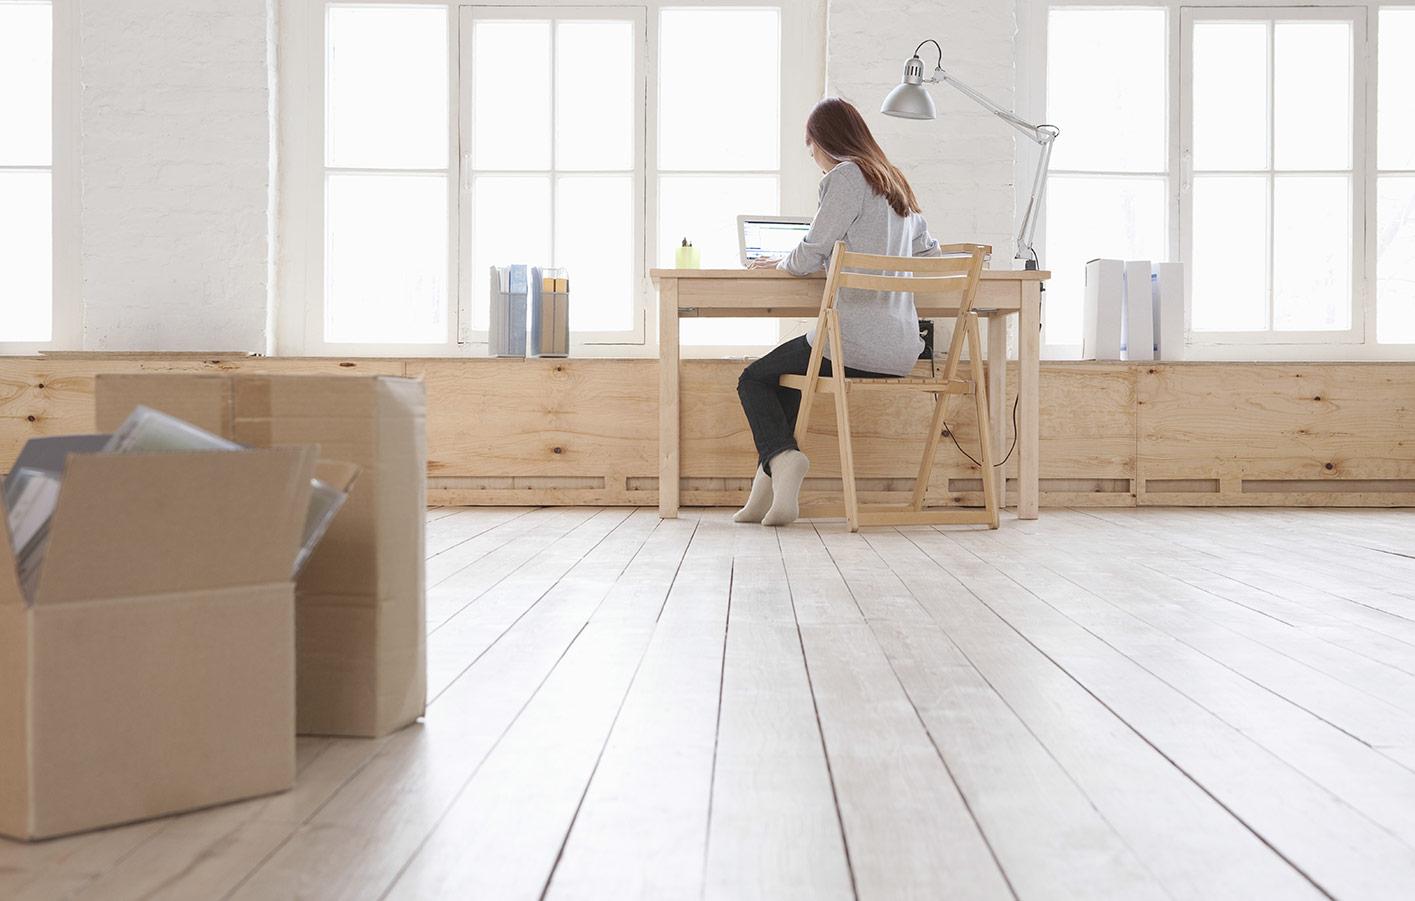 echtholzdielen massivholzdielen massiv parkett f r auerbach vogtland plauen treuen adorf. Black Bedroom Furniture Sets. Home Design Ideas